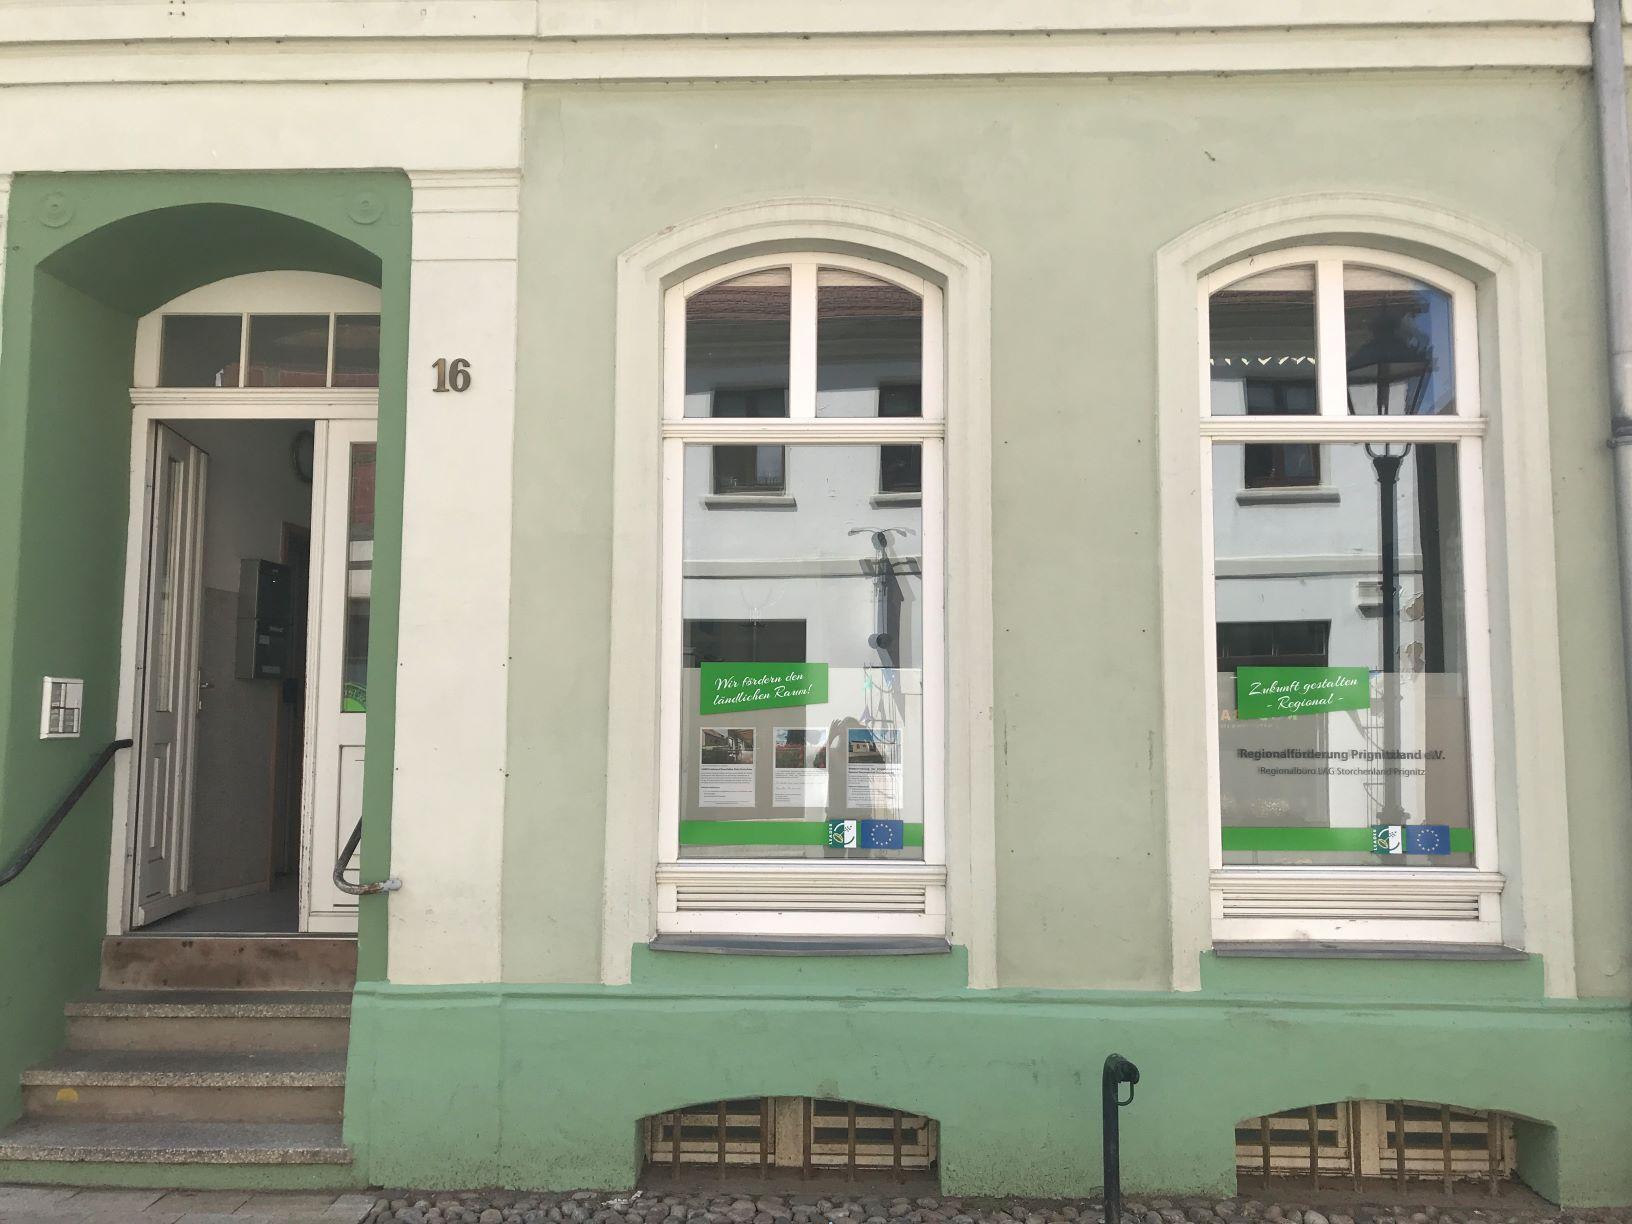 Regionalbüro der LAG Storchenland Prignitz in Perleberg